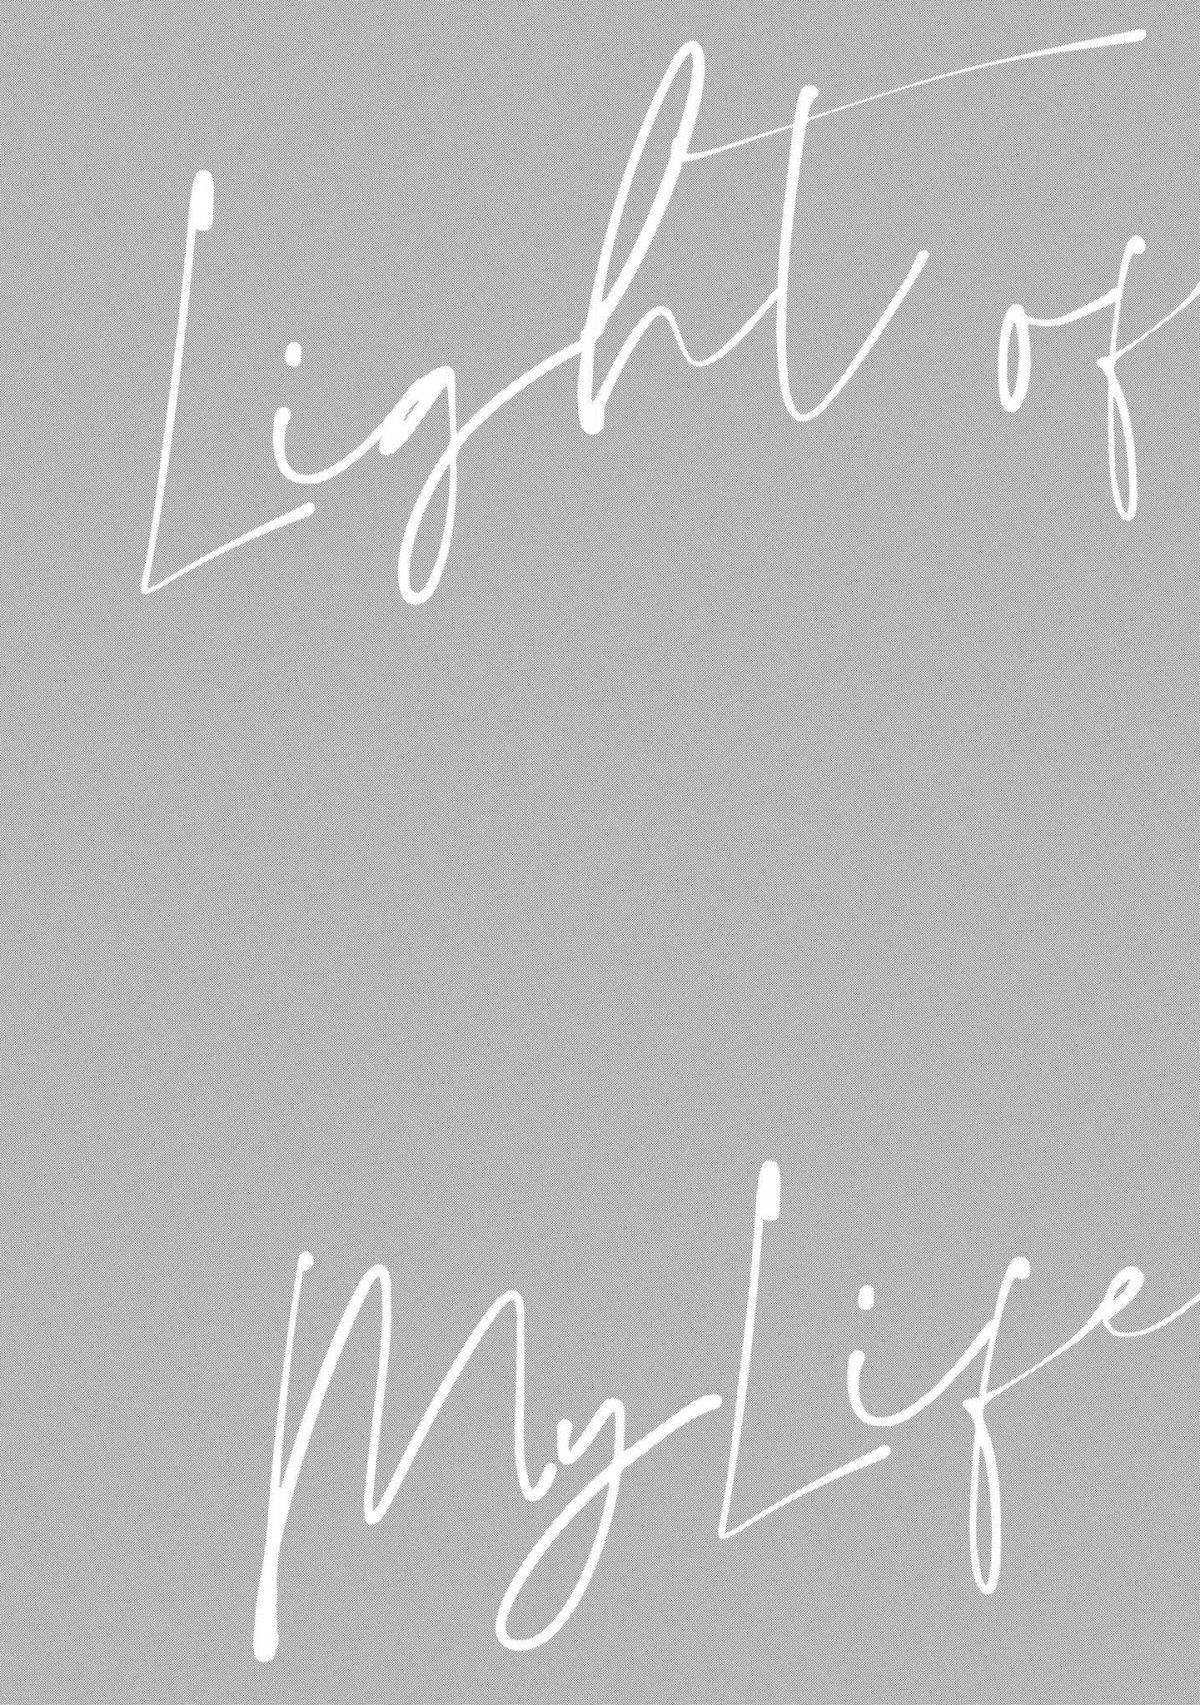 Light of my life | 生命之光 02-05 119